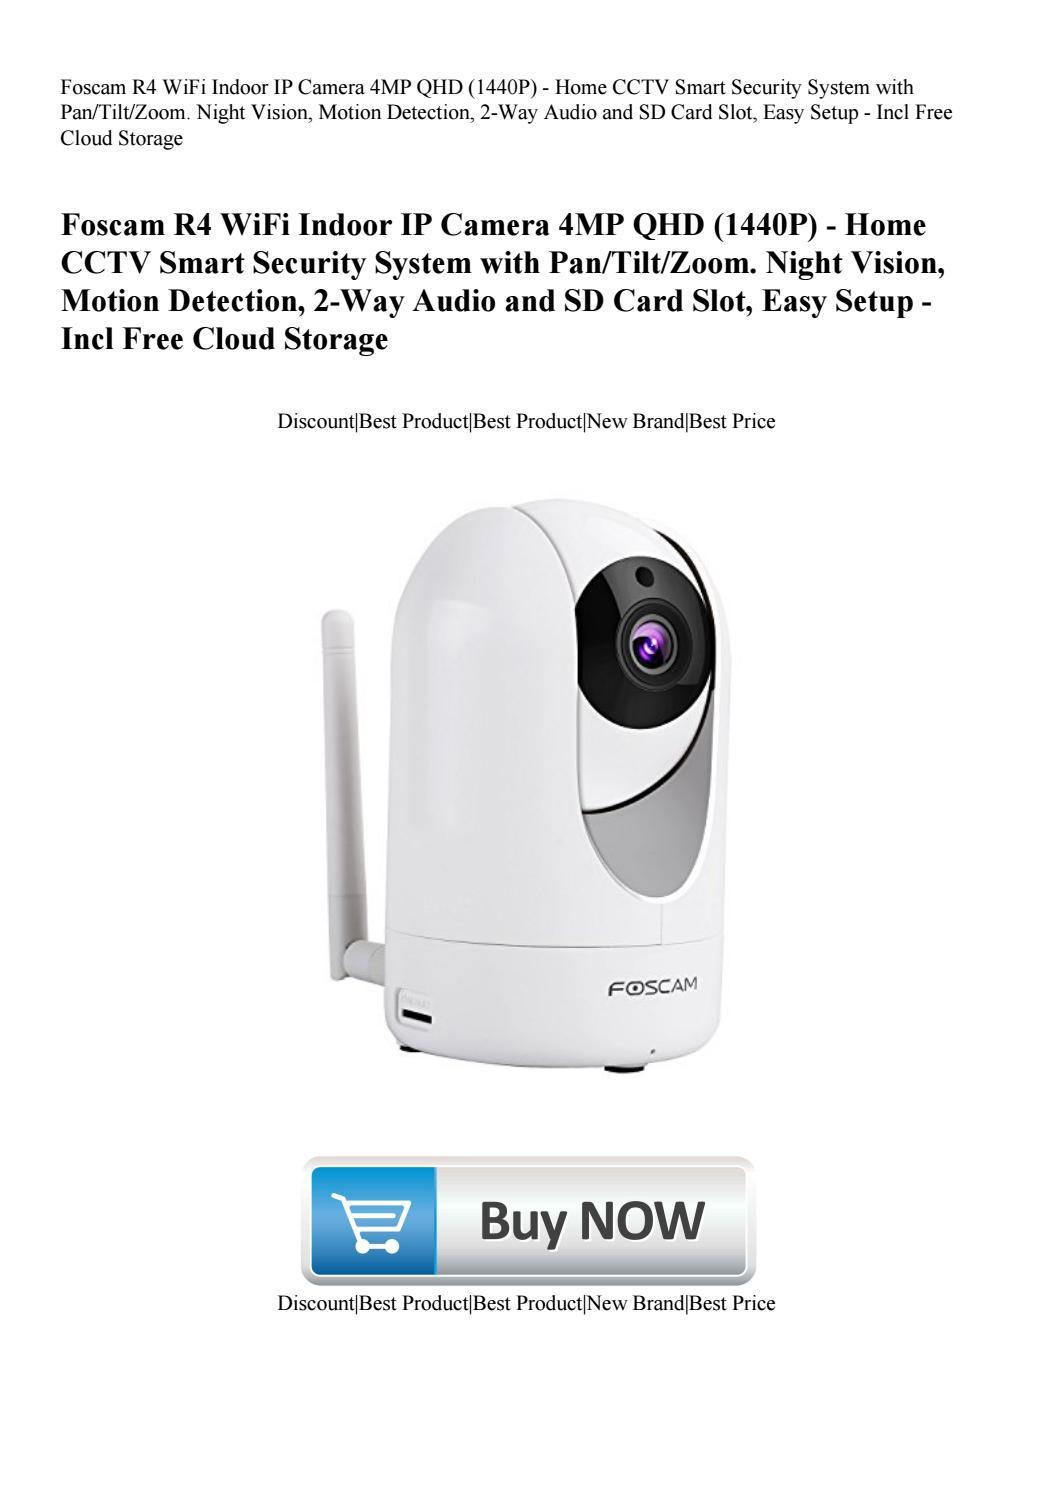 Foscam R4 WiFi Indoor IP Camera 4MP QHD (1440P) - Home CCTV